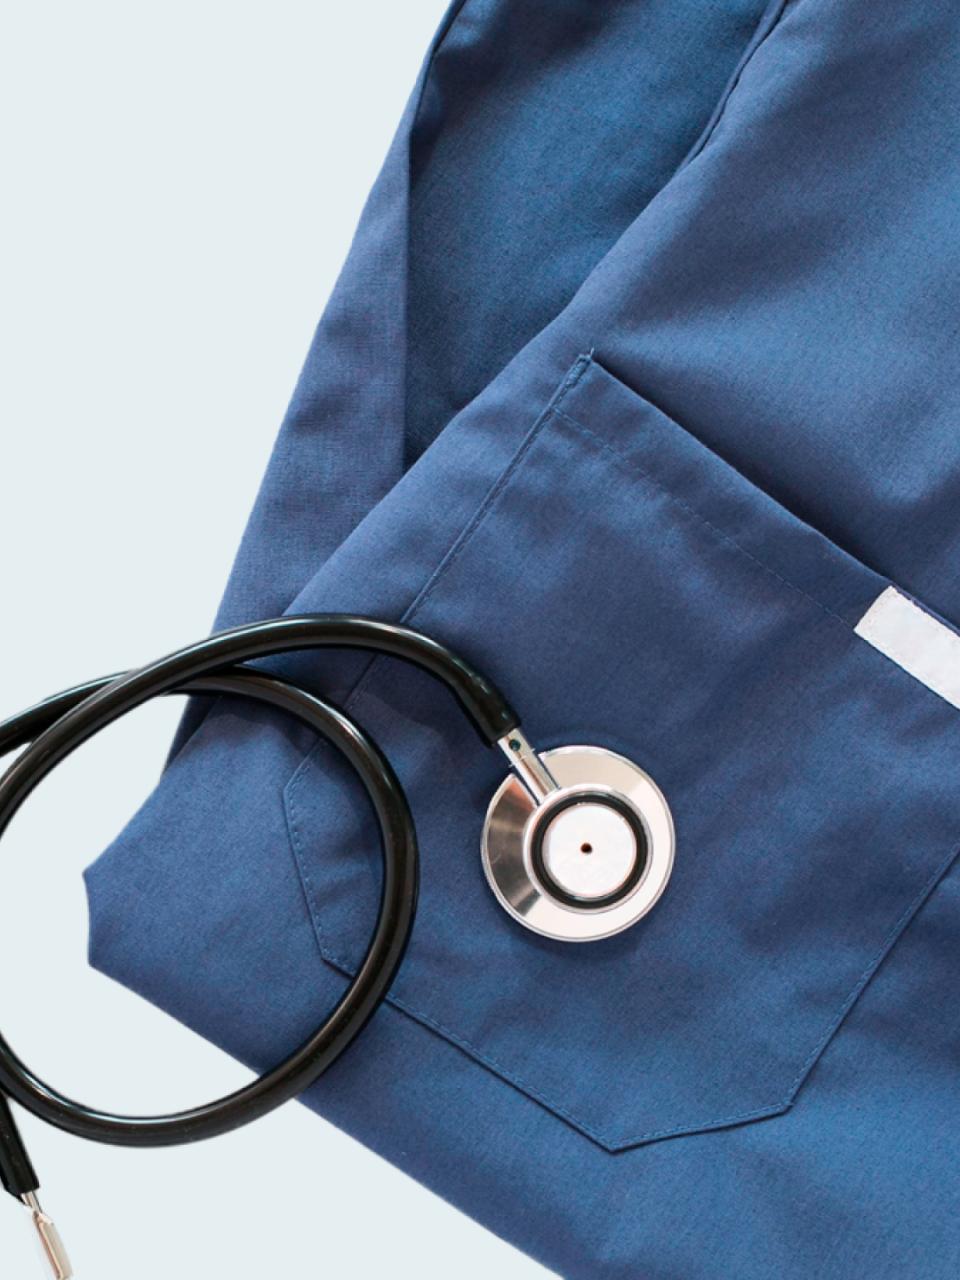 Data analysis app for medical garment usage prediction